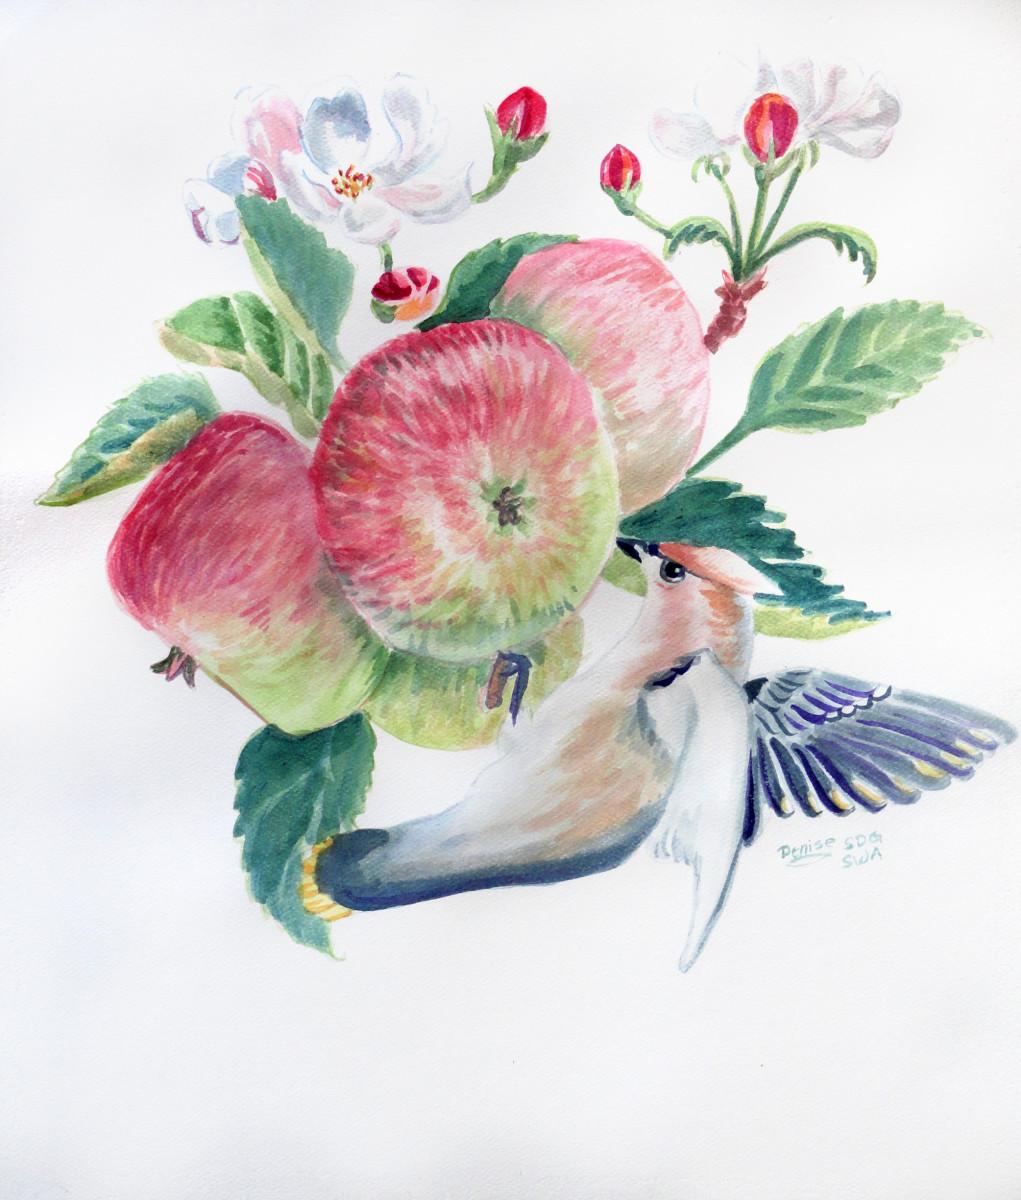 Cedar Waxwing and Apples in watercolor